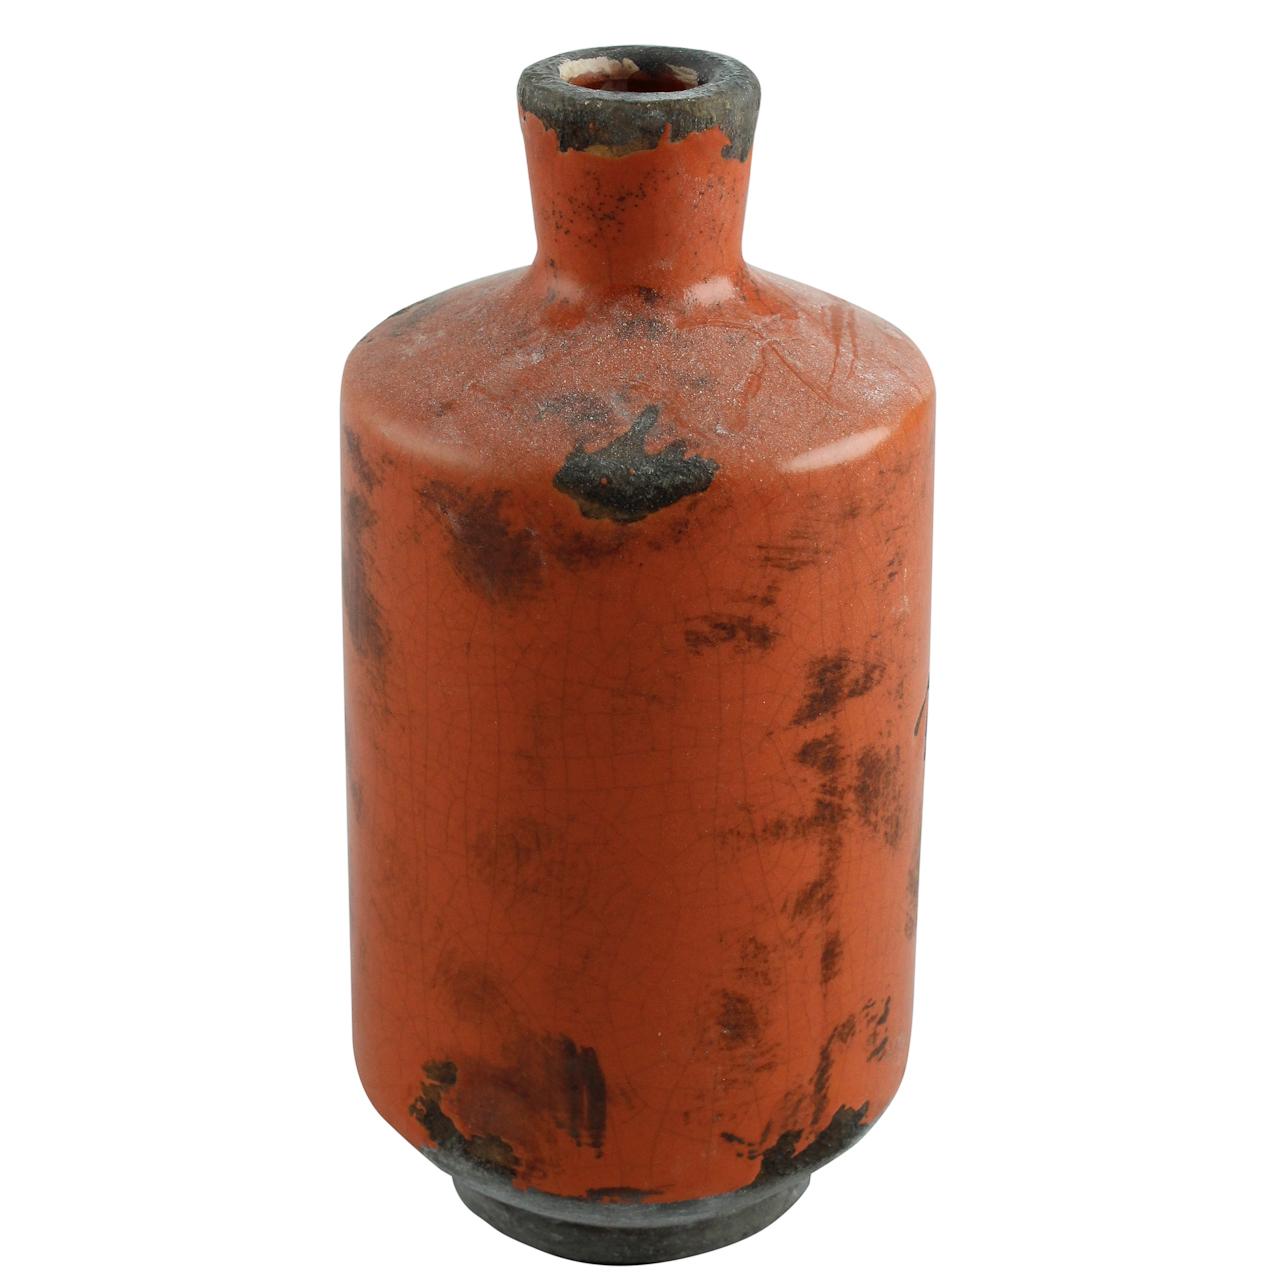 Vaza Cu Gat Din Teracota Portocalie 19.5 Cm